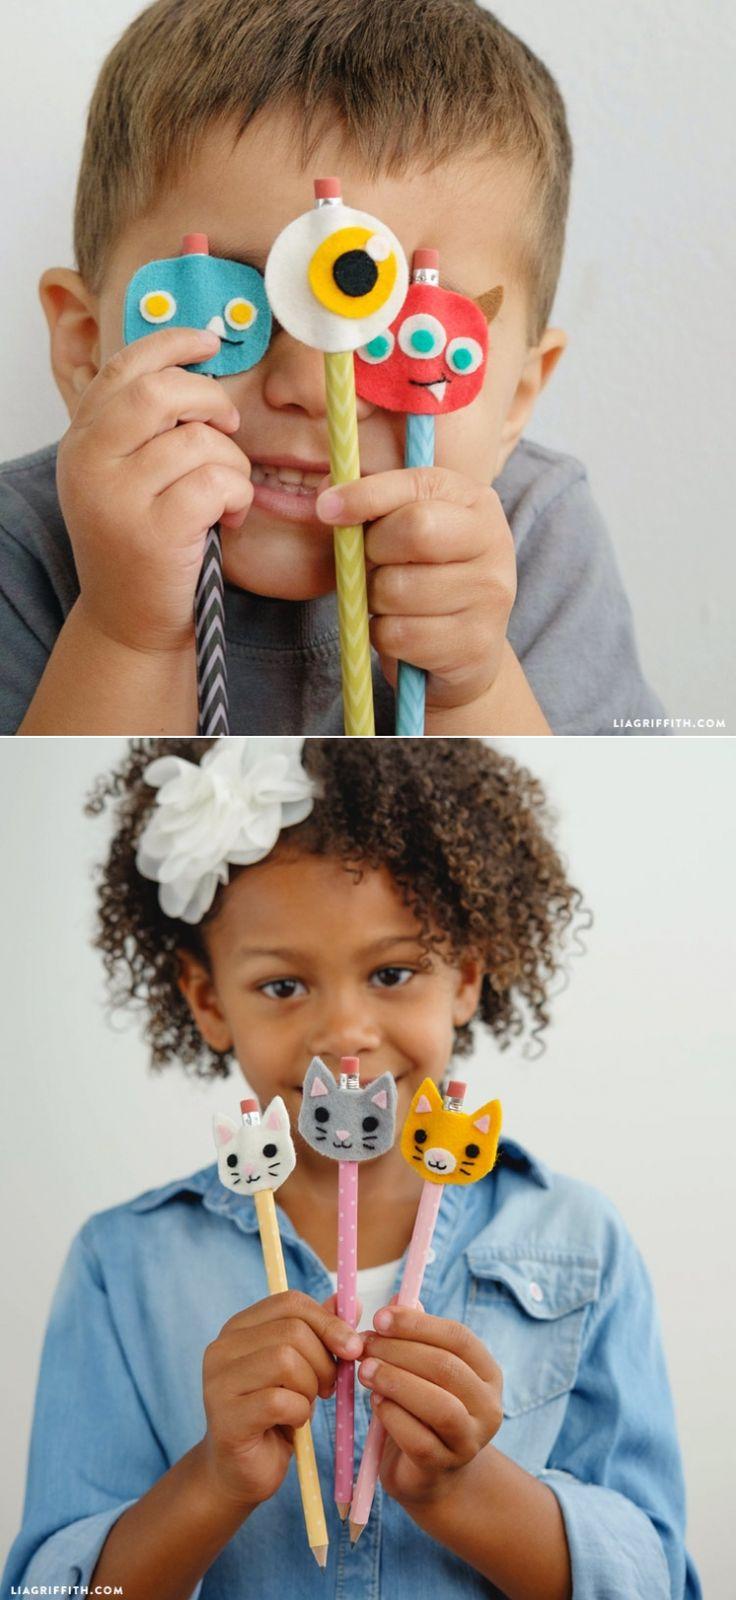 #DIYPencilTopper #FeltCraft #KidsCraft www.LiaGriffith.com